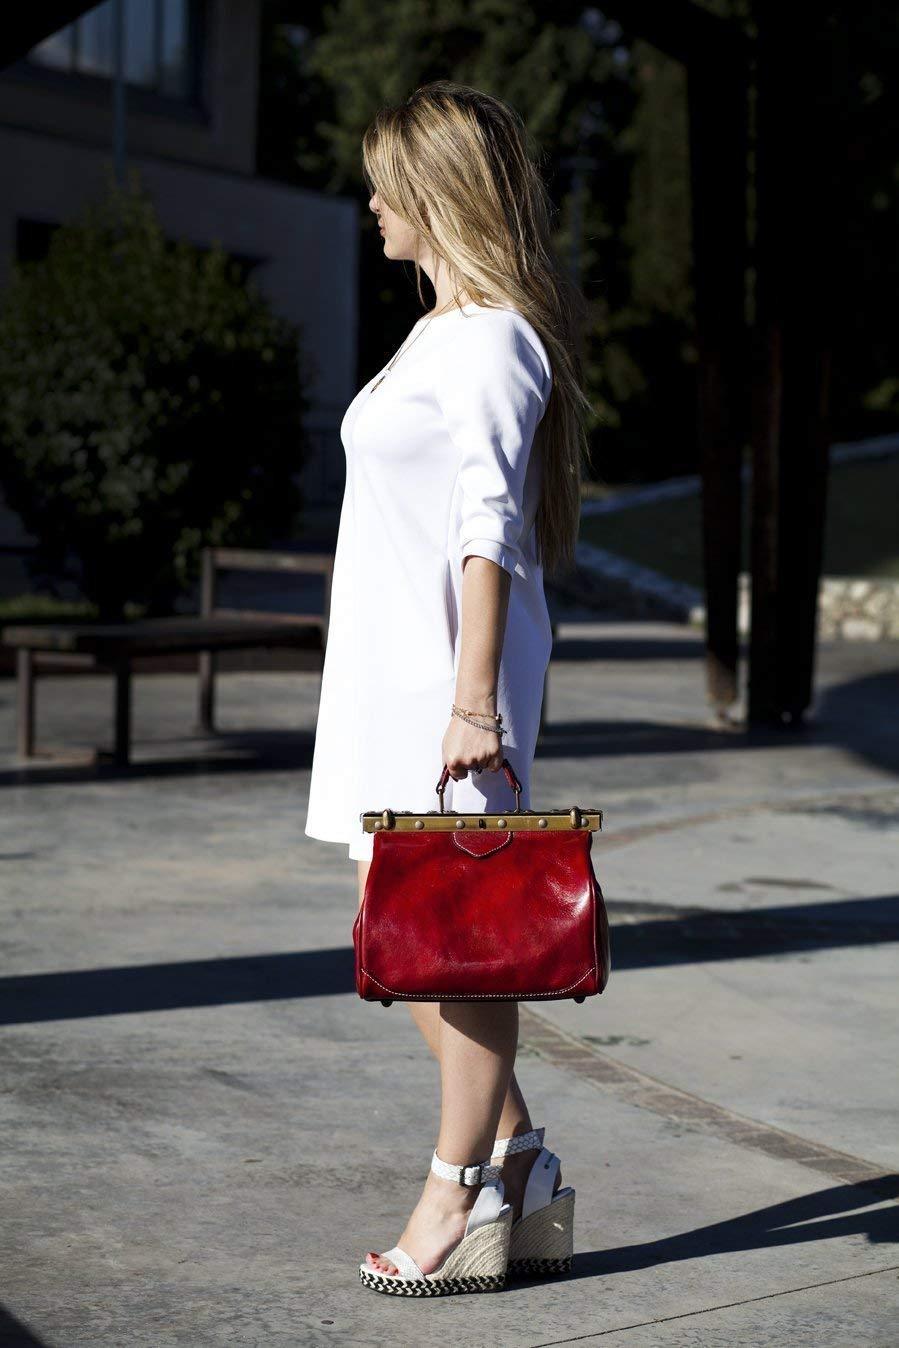 Ladies leather handbag doctor bag handheld shoulder bag medical purse honey made in Italy - handmade-bags